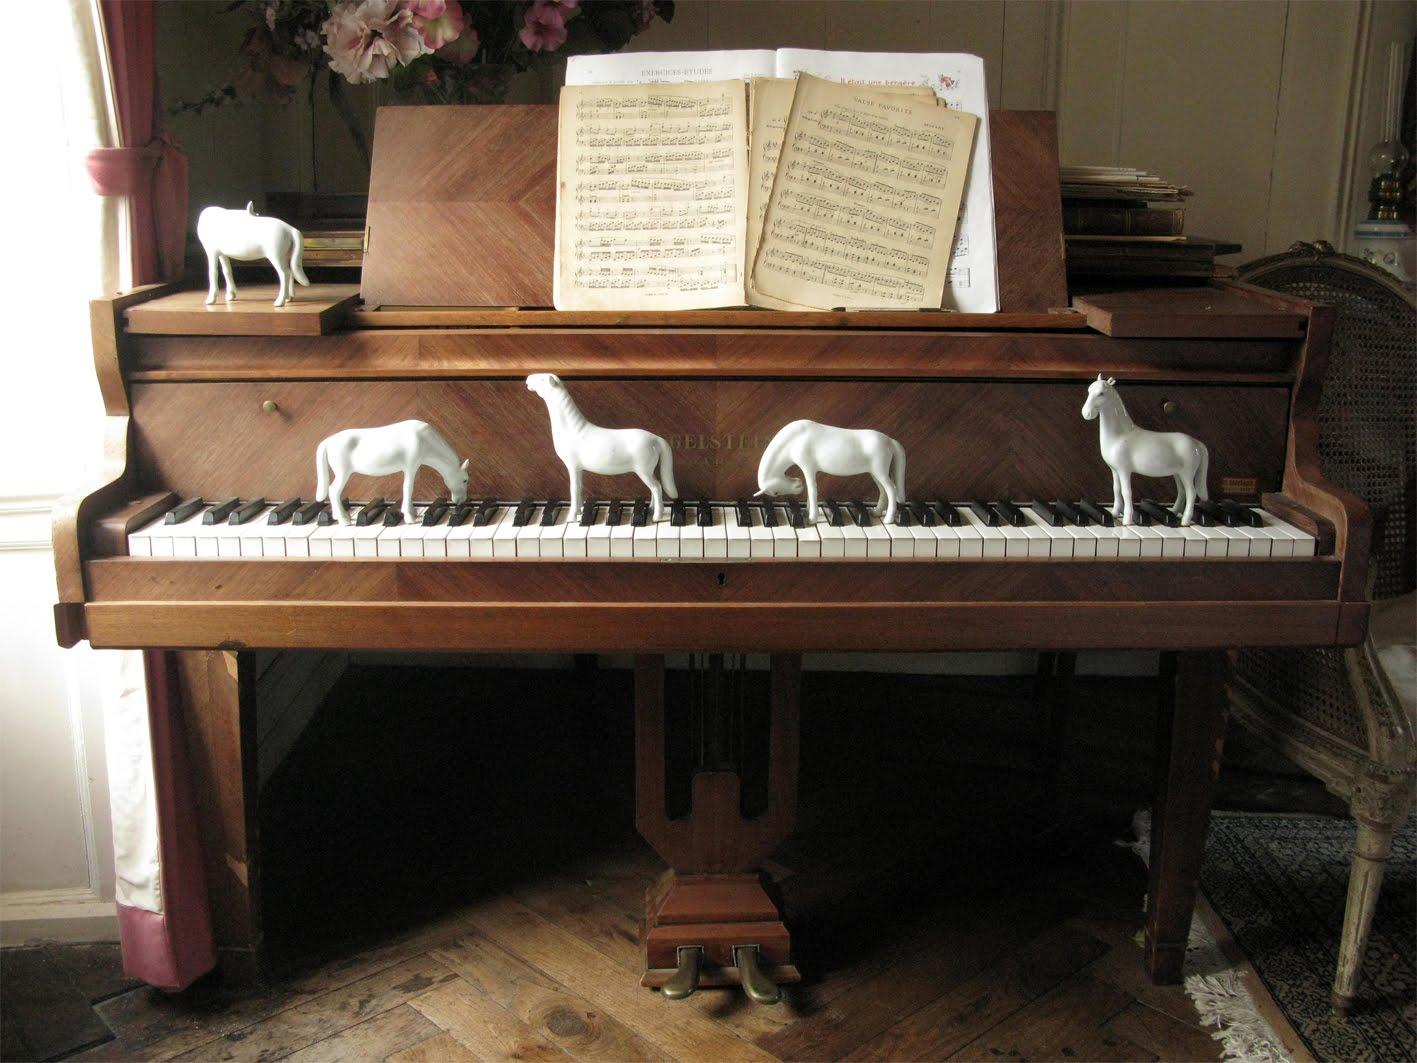 [chevaux_piano_web.jpg]